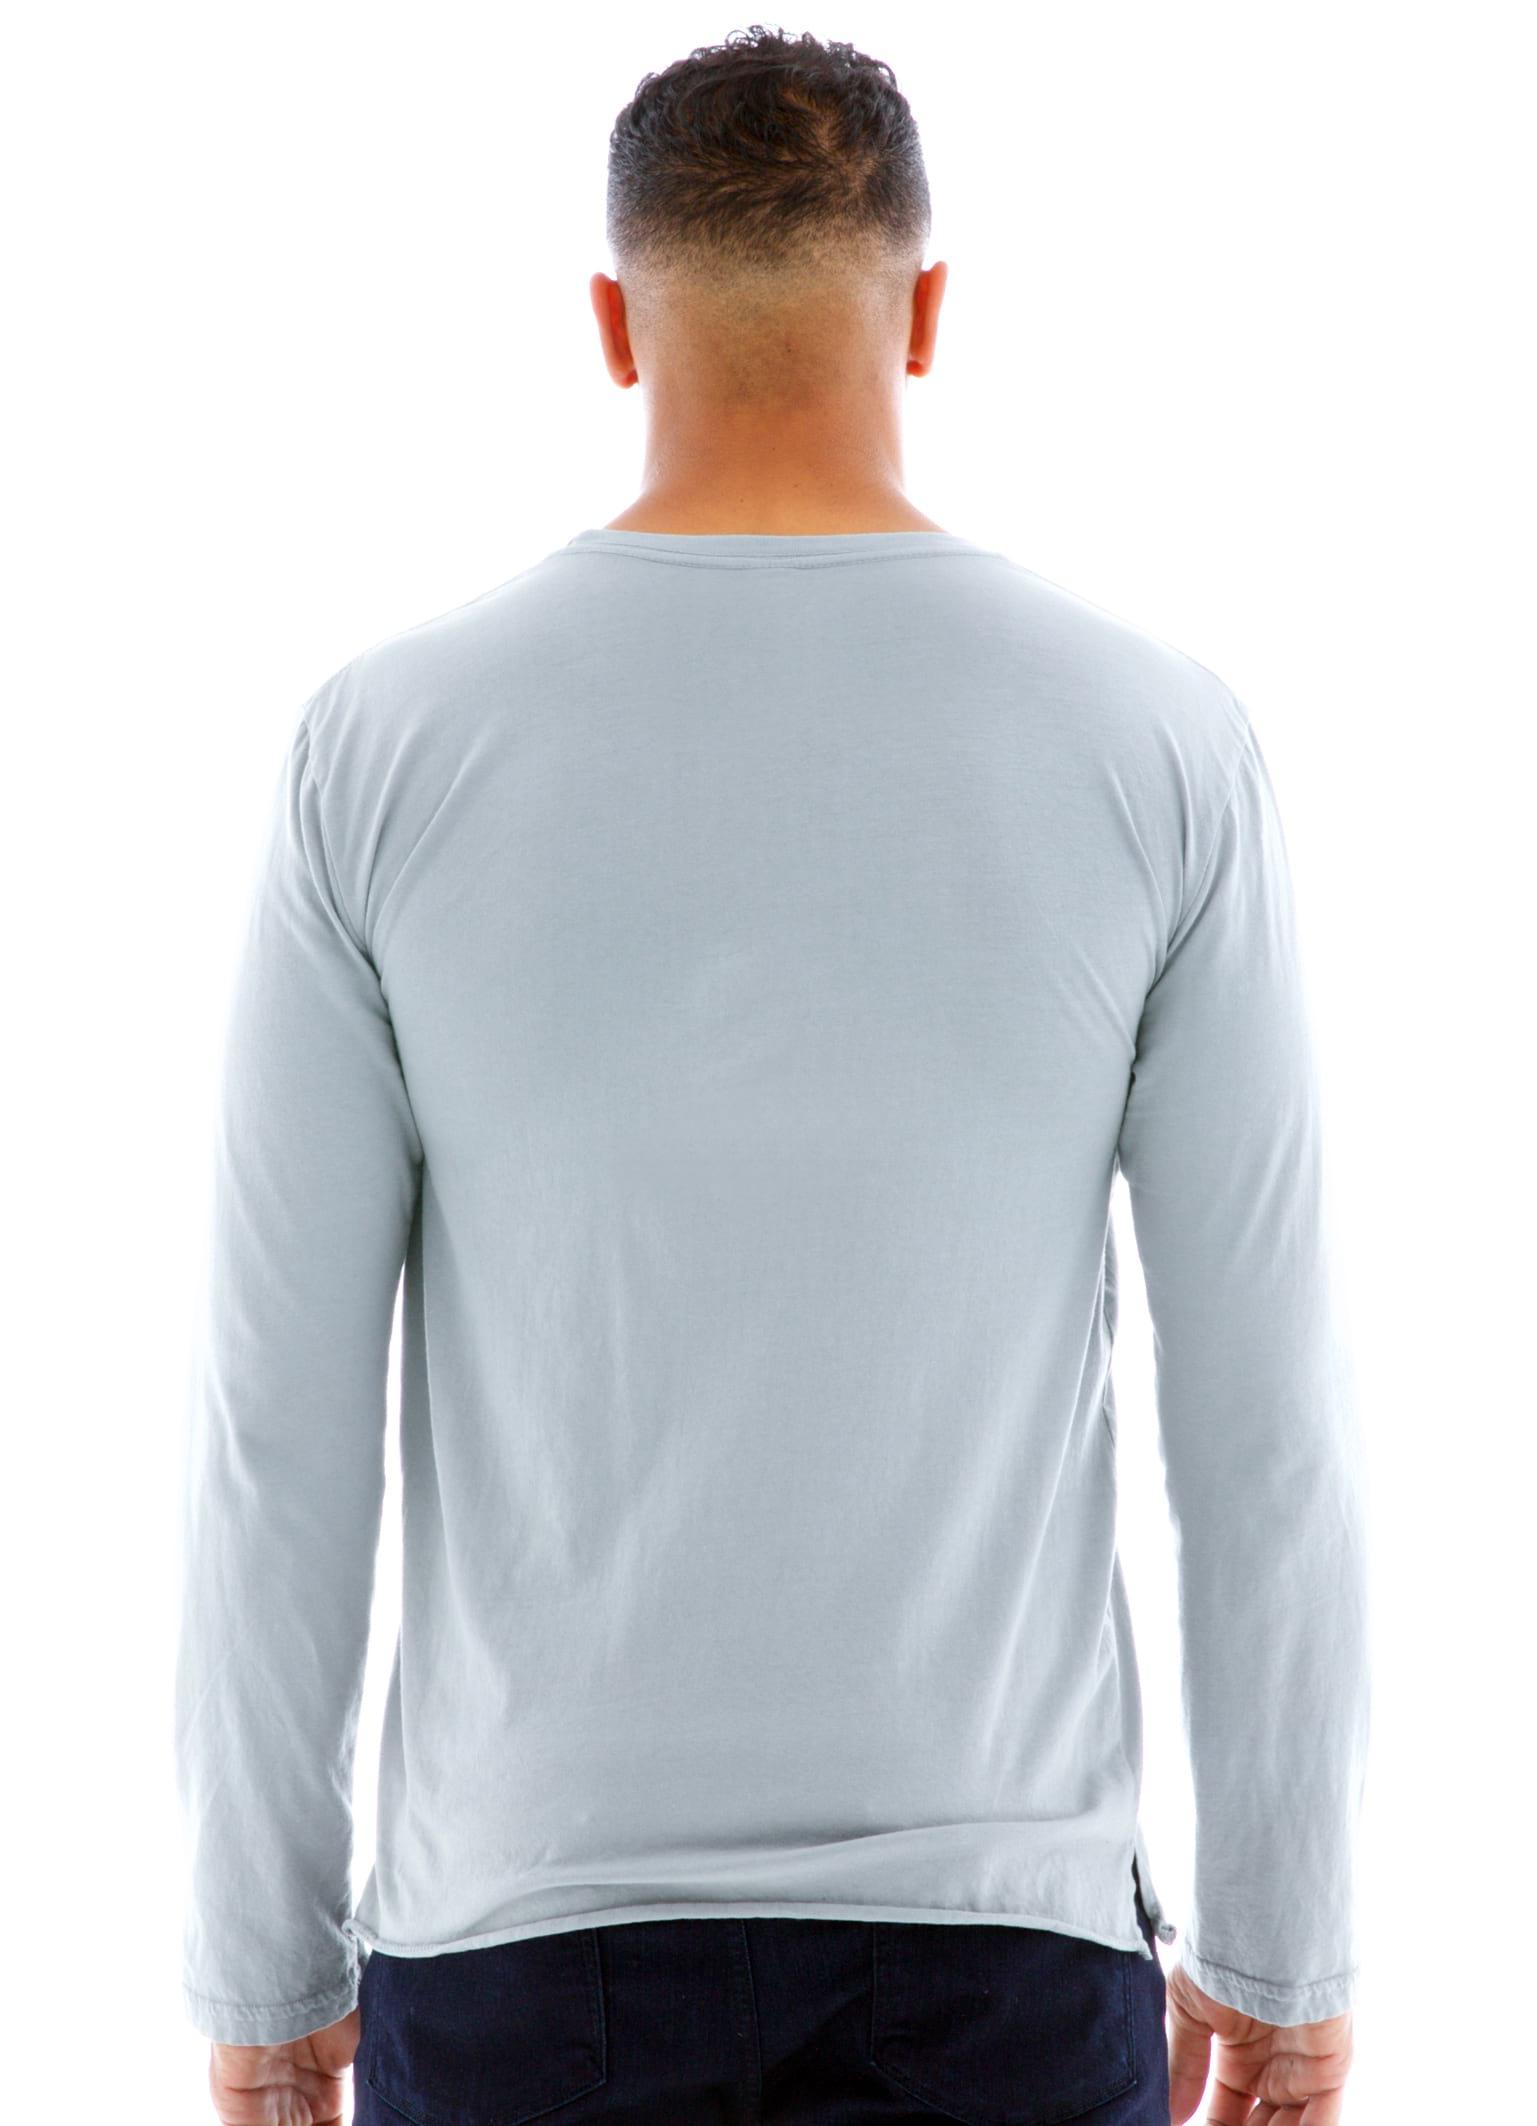 Long Sleeve Jersey Crew T-Shirt Back View